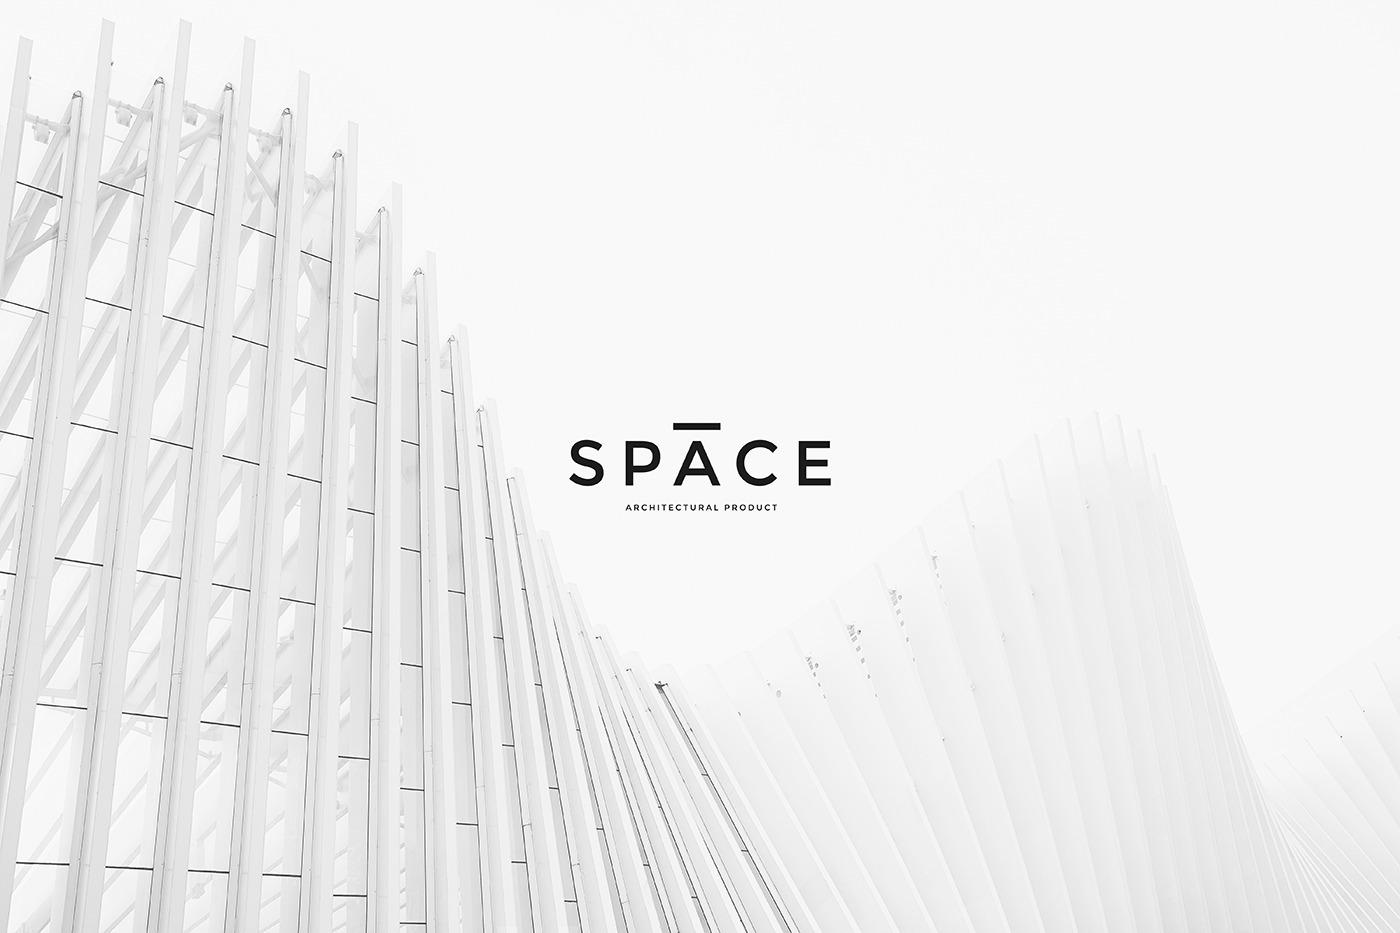 Super simple elegant branding d - barenbrug | ello